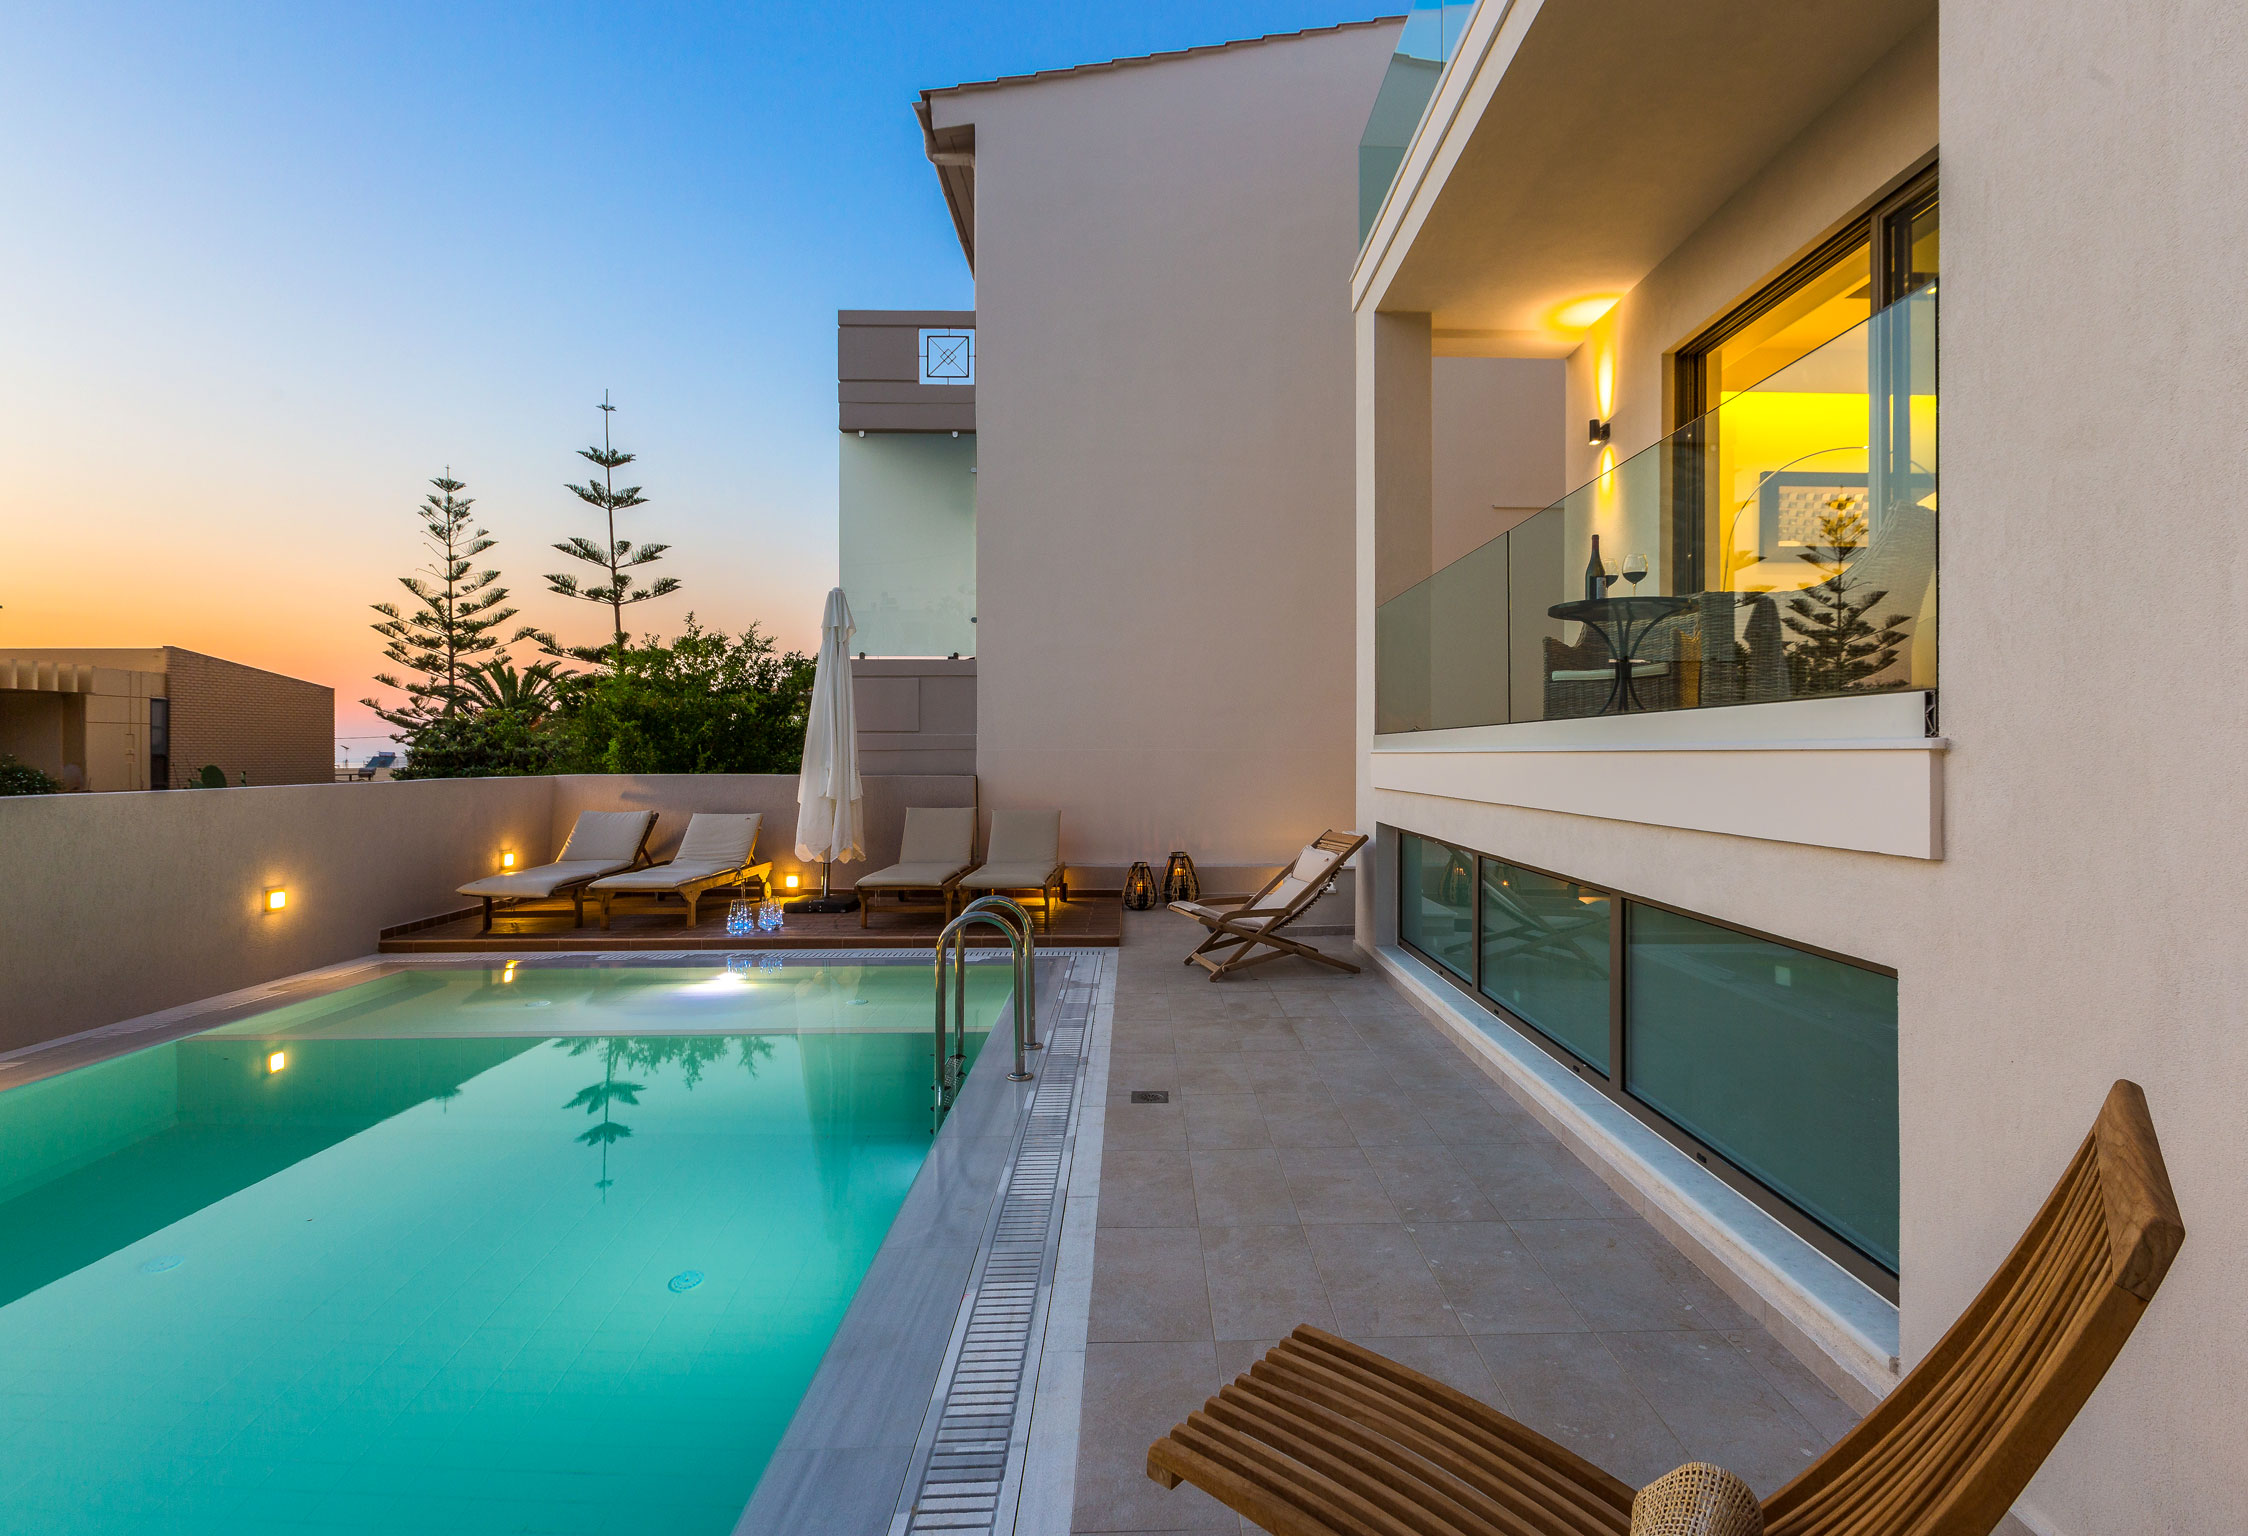 Crete Villa Adeline jumbotron image